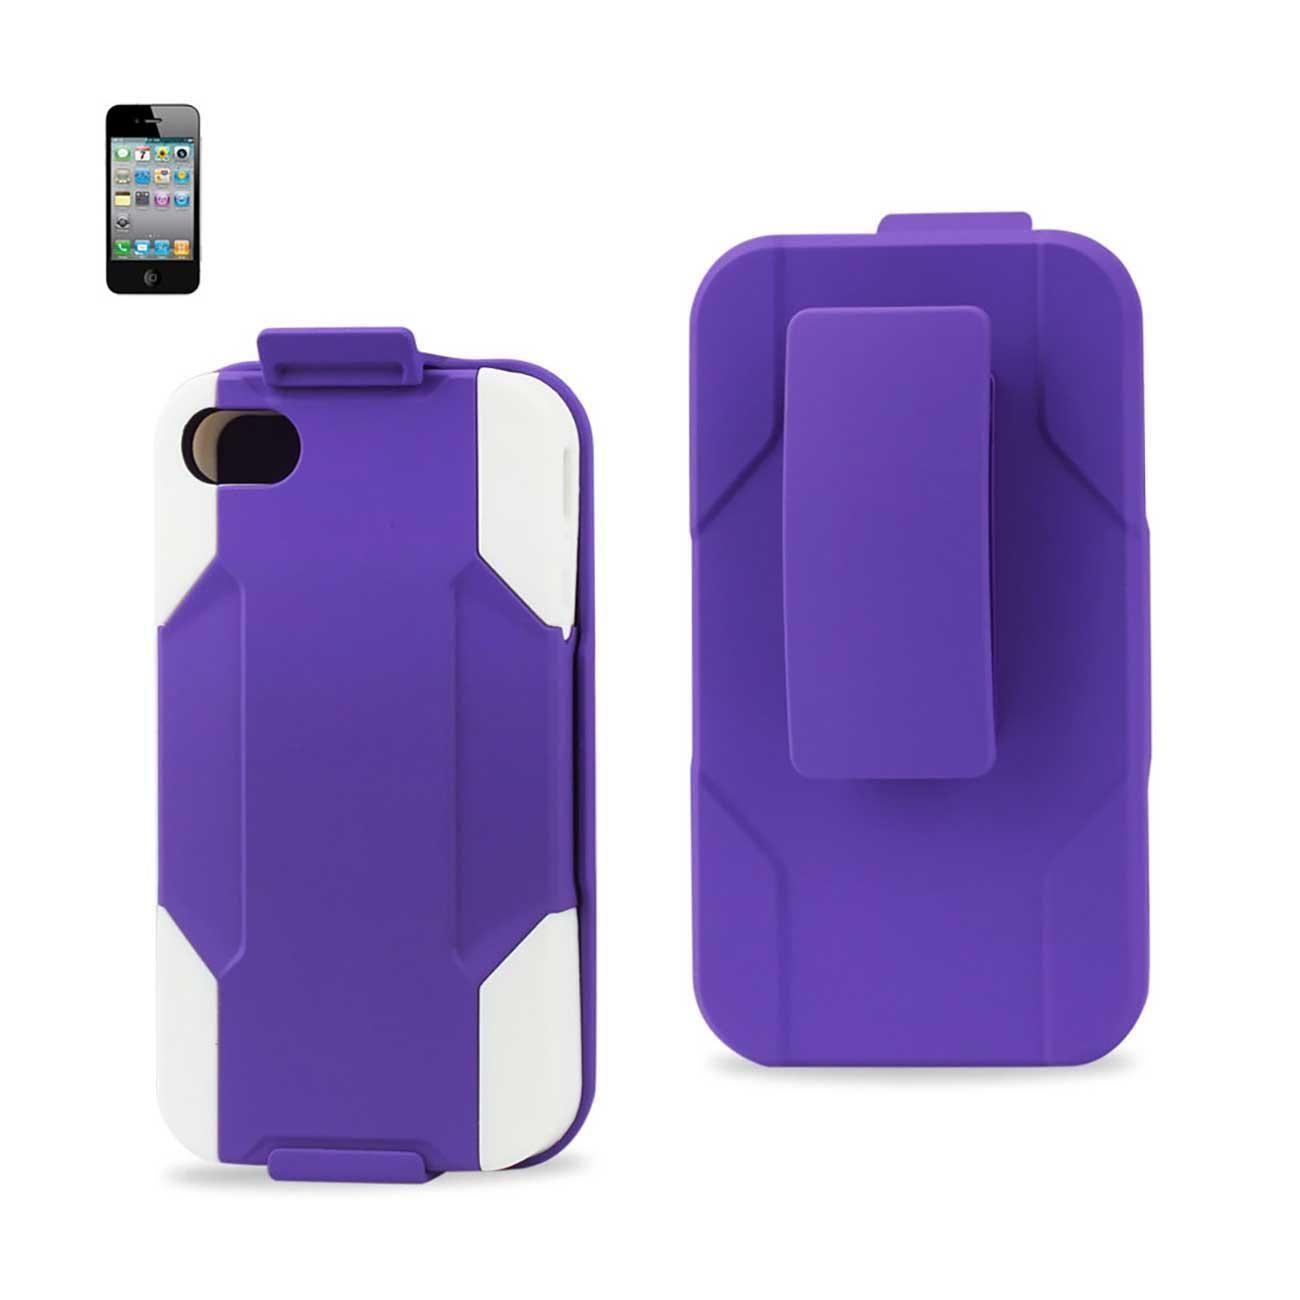 Reiko Iphone 4- 4g Hybrid Heavy Duty Holster Combo Case In White Purple